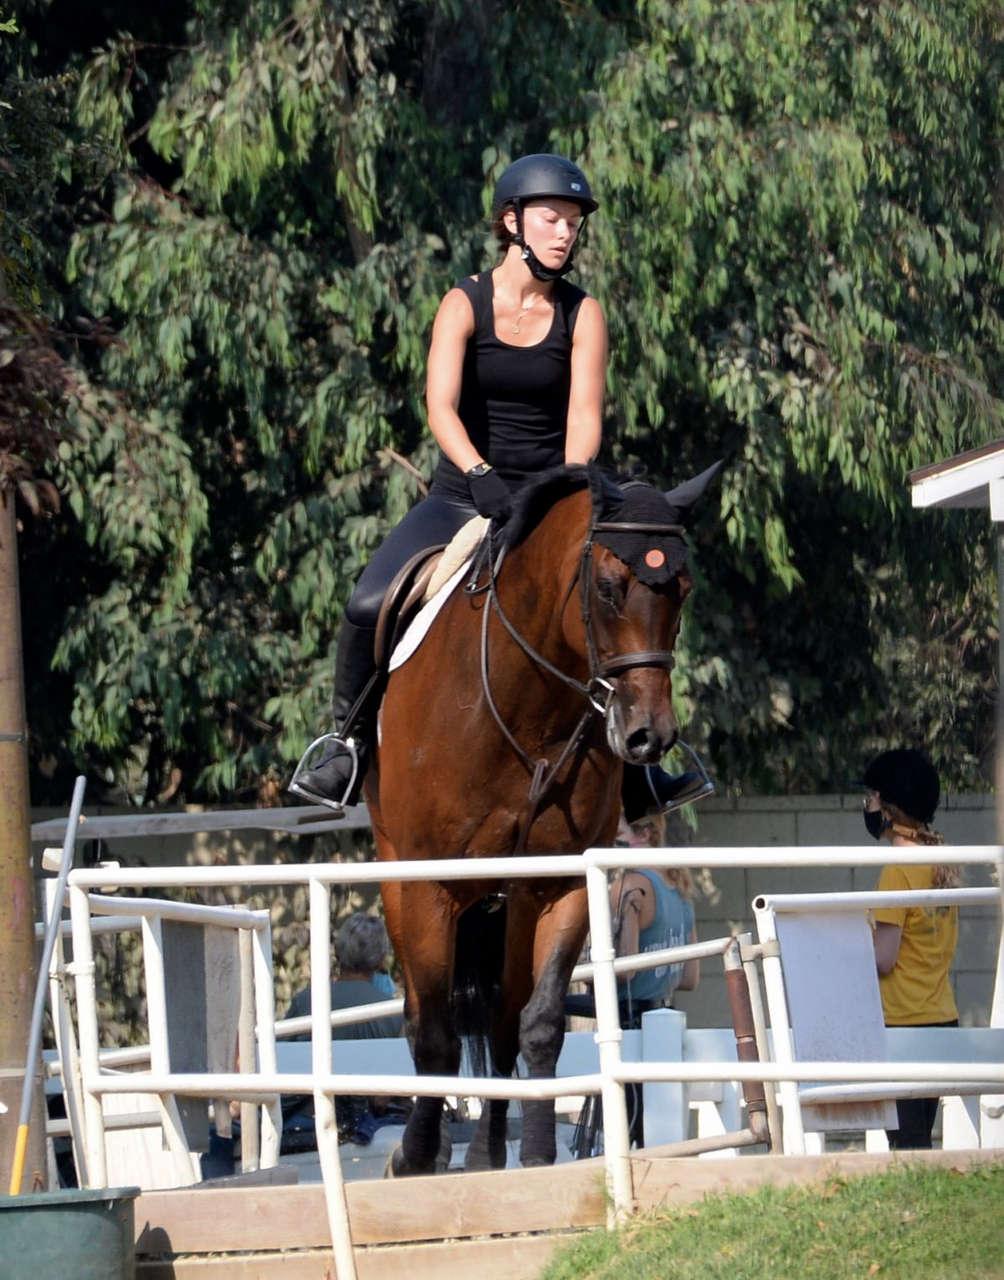 Olivia Wilde Horseback Riding Thousand Oaks